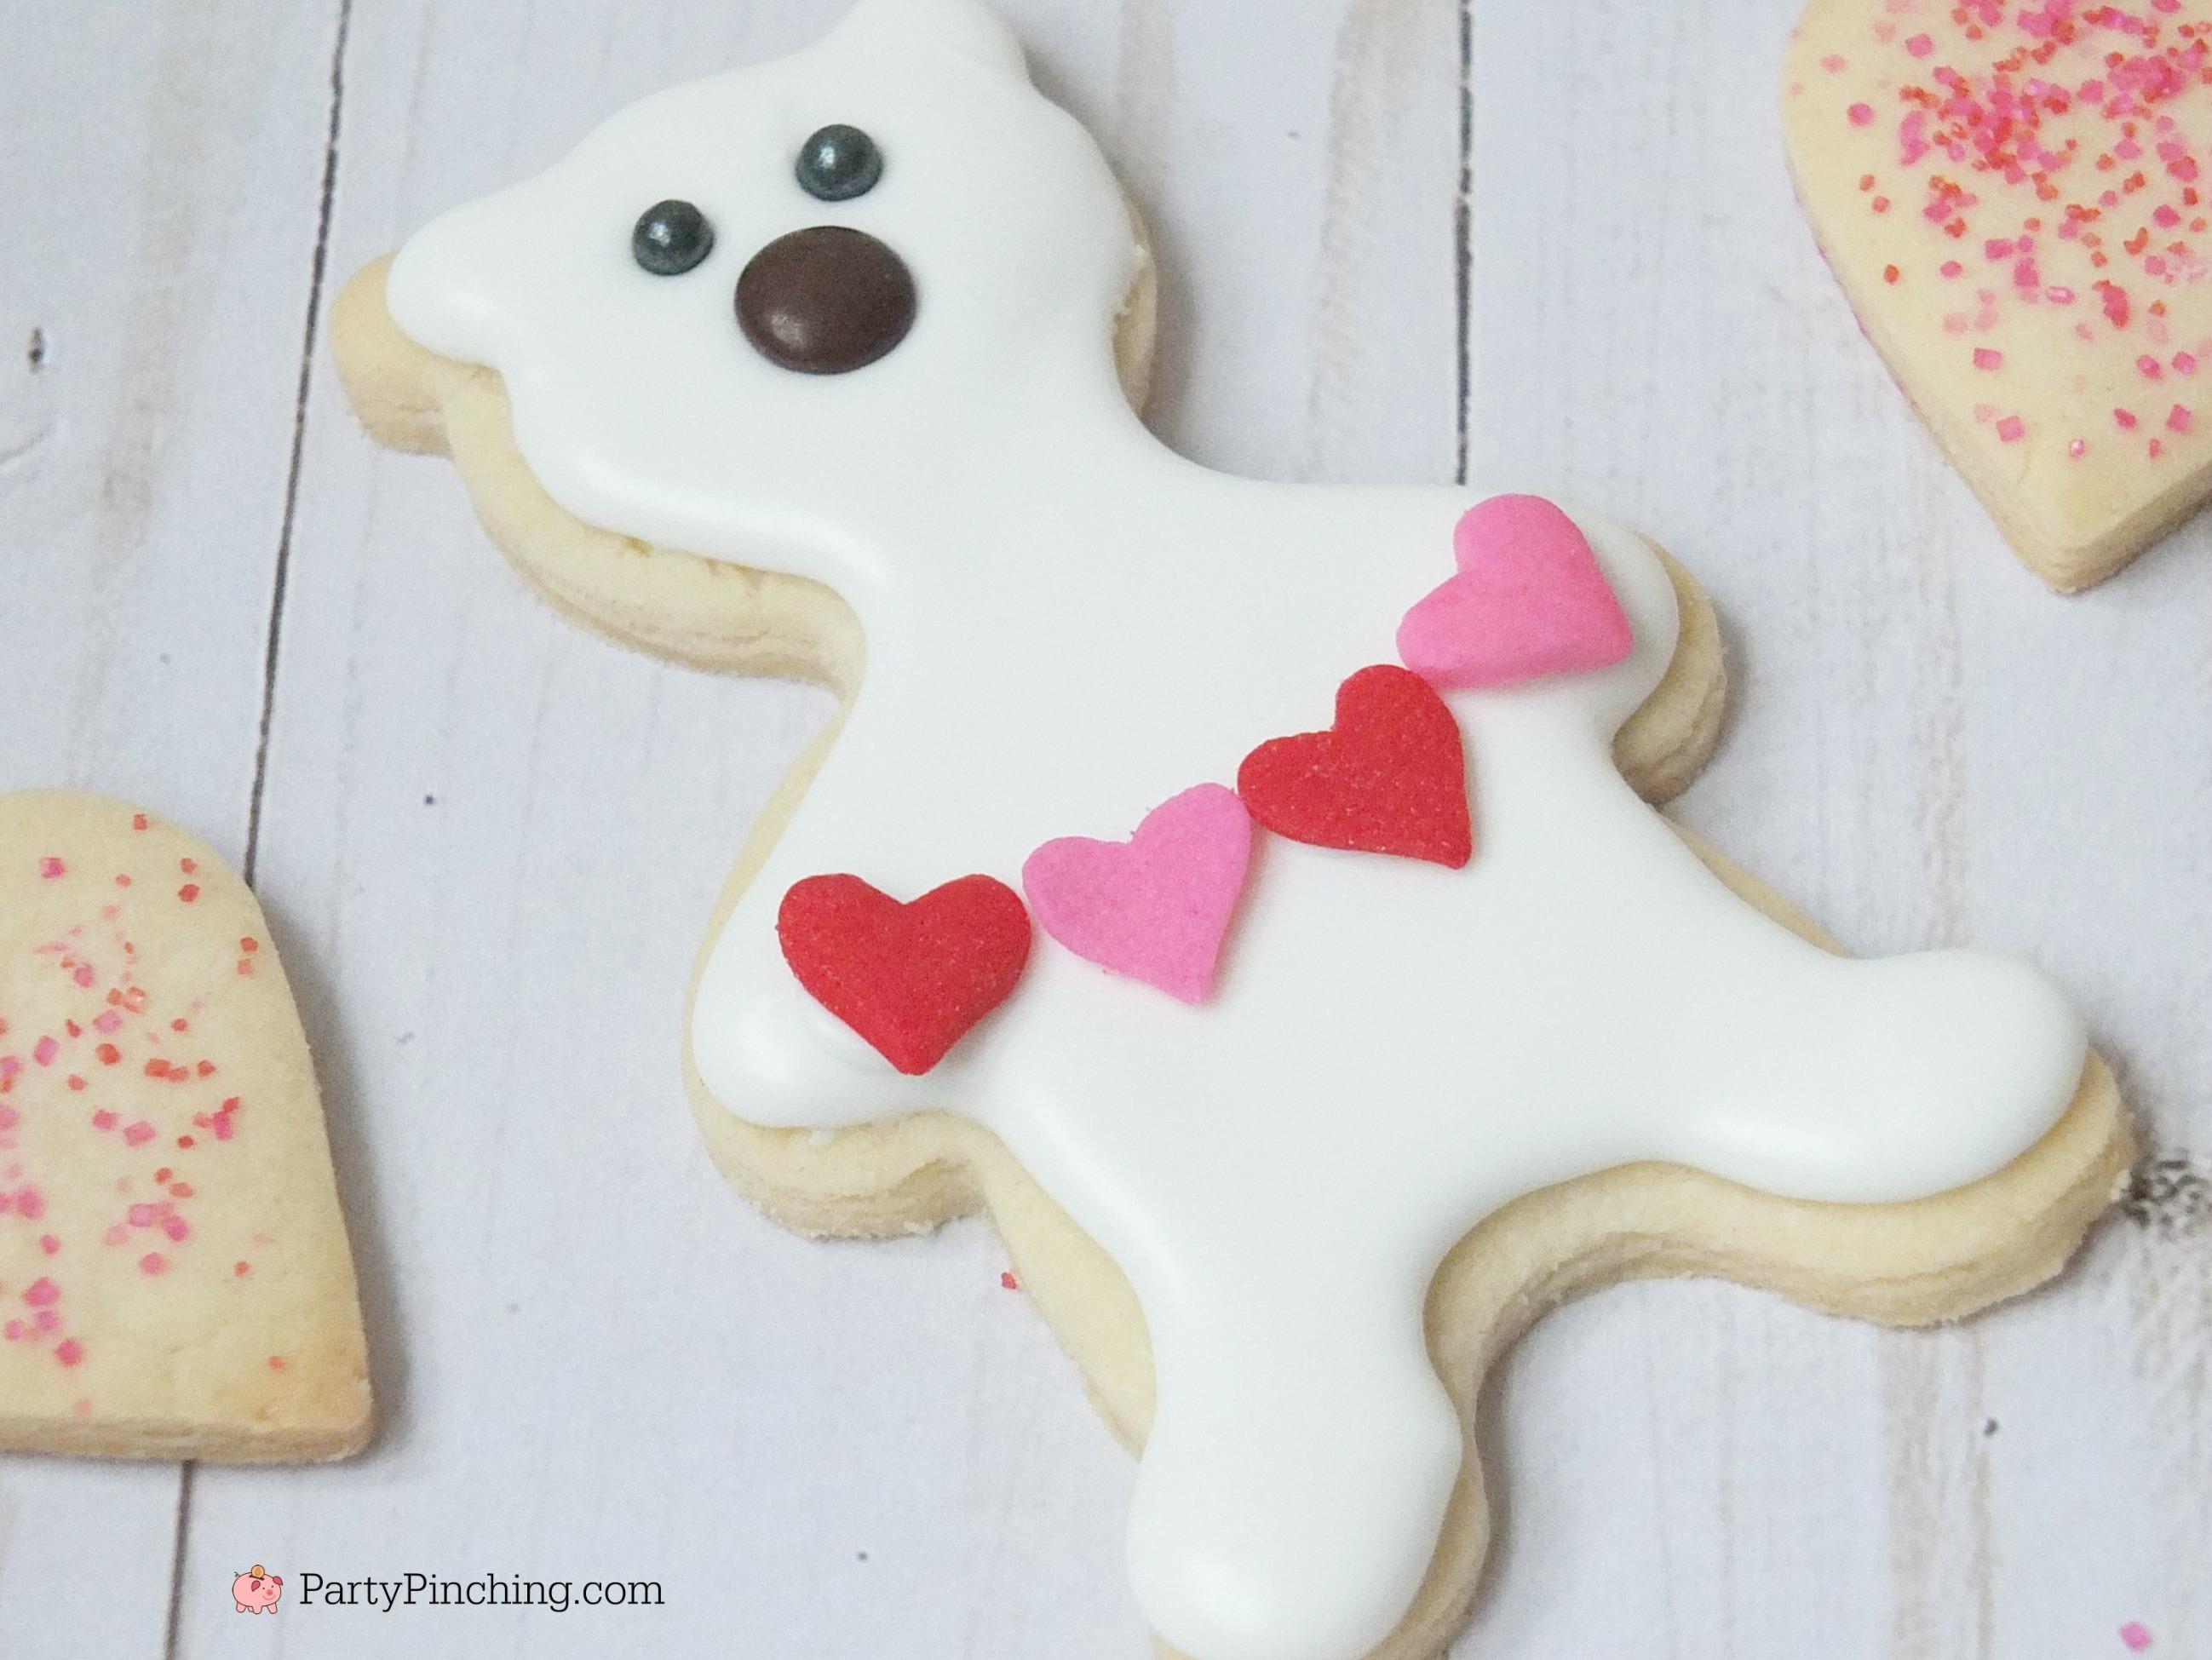 Polar bear cookies, Valentine's Day polar bear cookies, cute cookie ideas for Valentine's Day, polar bear sweater cookie, polar bear heart garland cookie, fun food for kids, cute food ideas, sweet treats